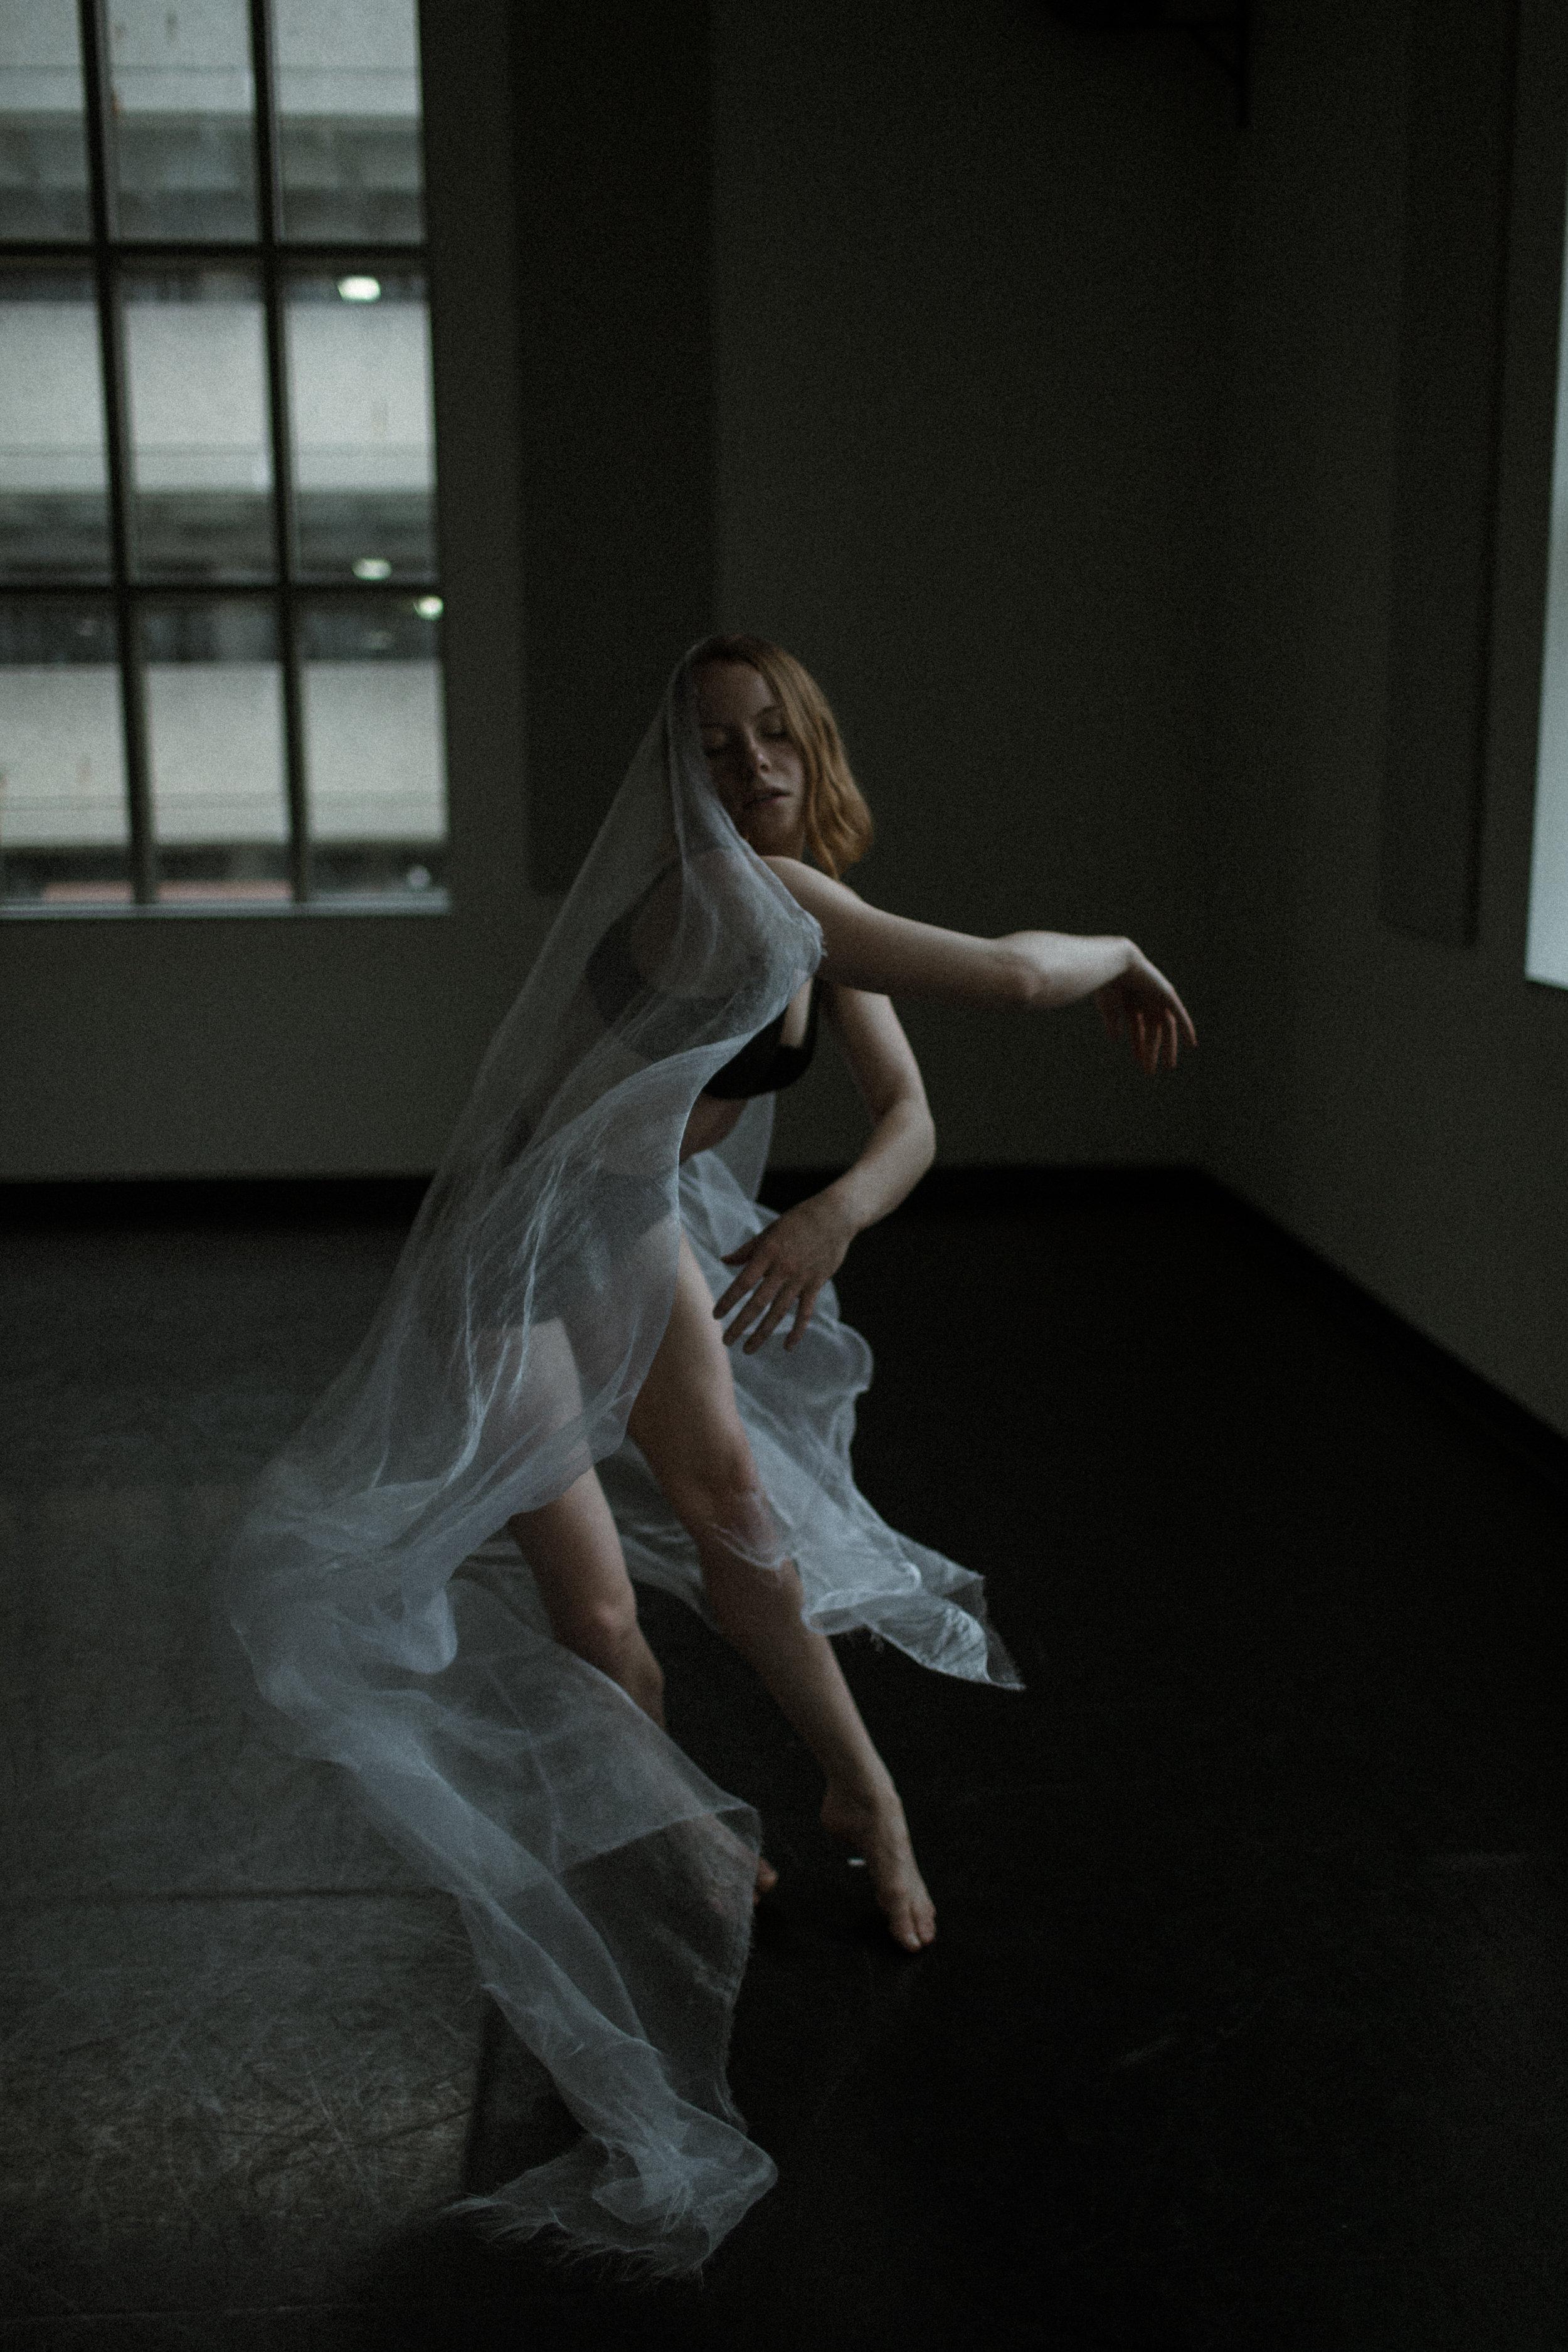 maddie rose dancer ohio state university sullivant hall dance portraits by sarah rose photography iamsarahrose